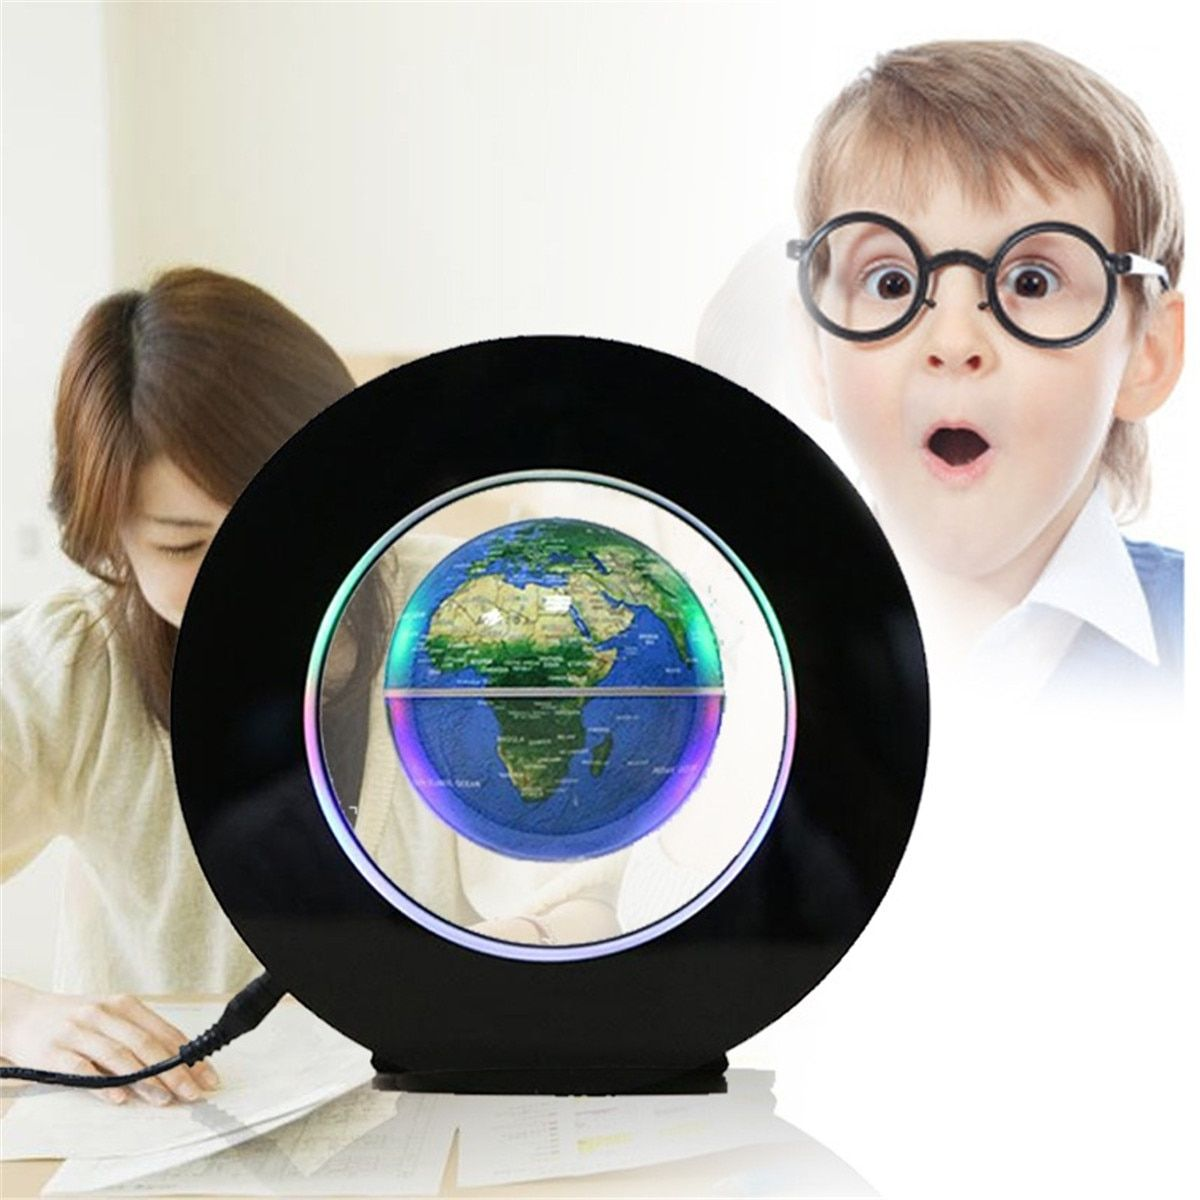 4 Inch Magnetic Levitation Floating Globe Map LED Light Home Office Decoration Ornament EU Plug For Kids Learning Knowledge